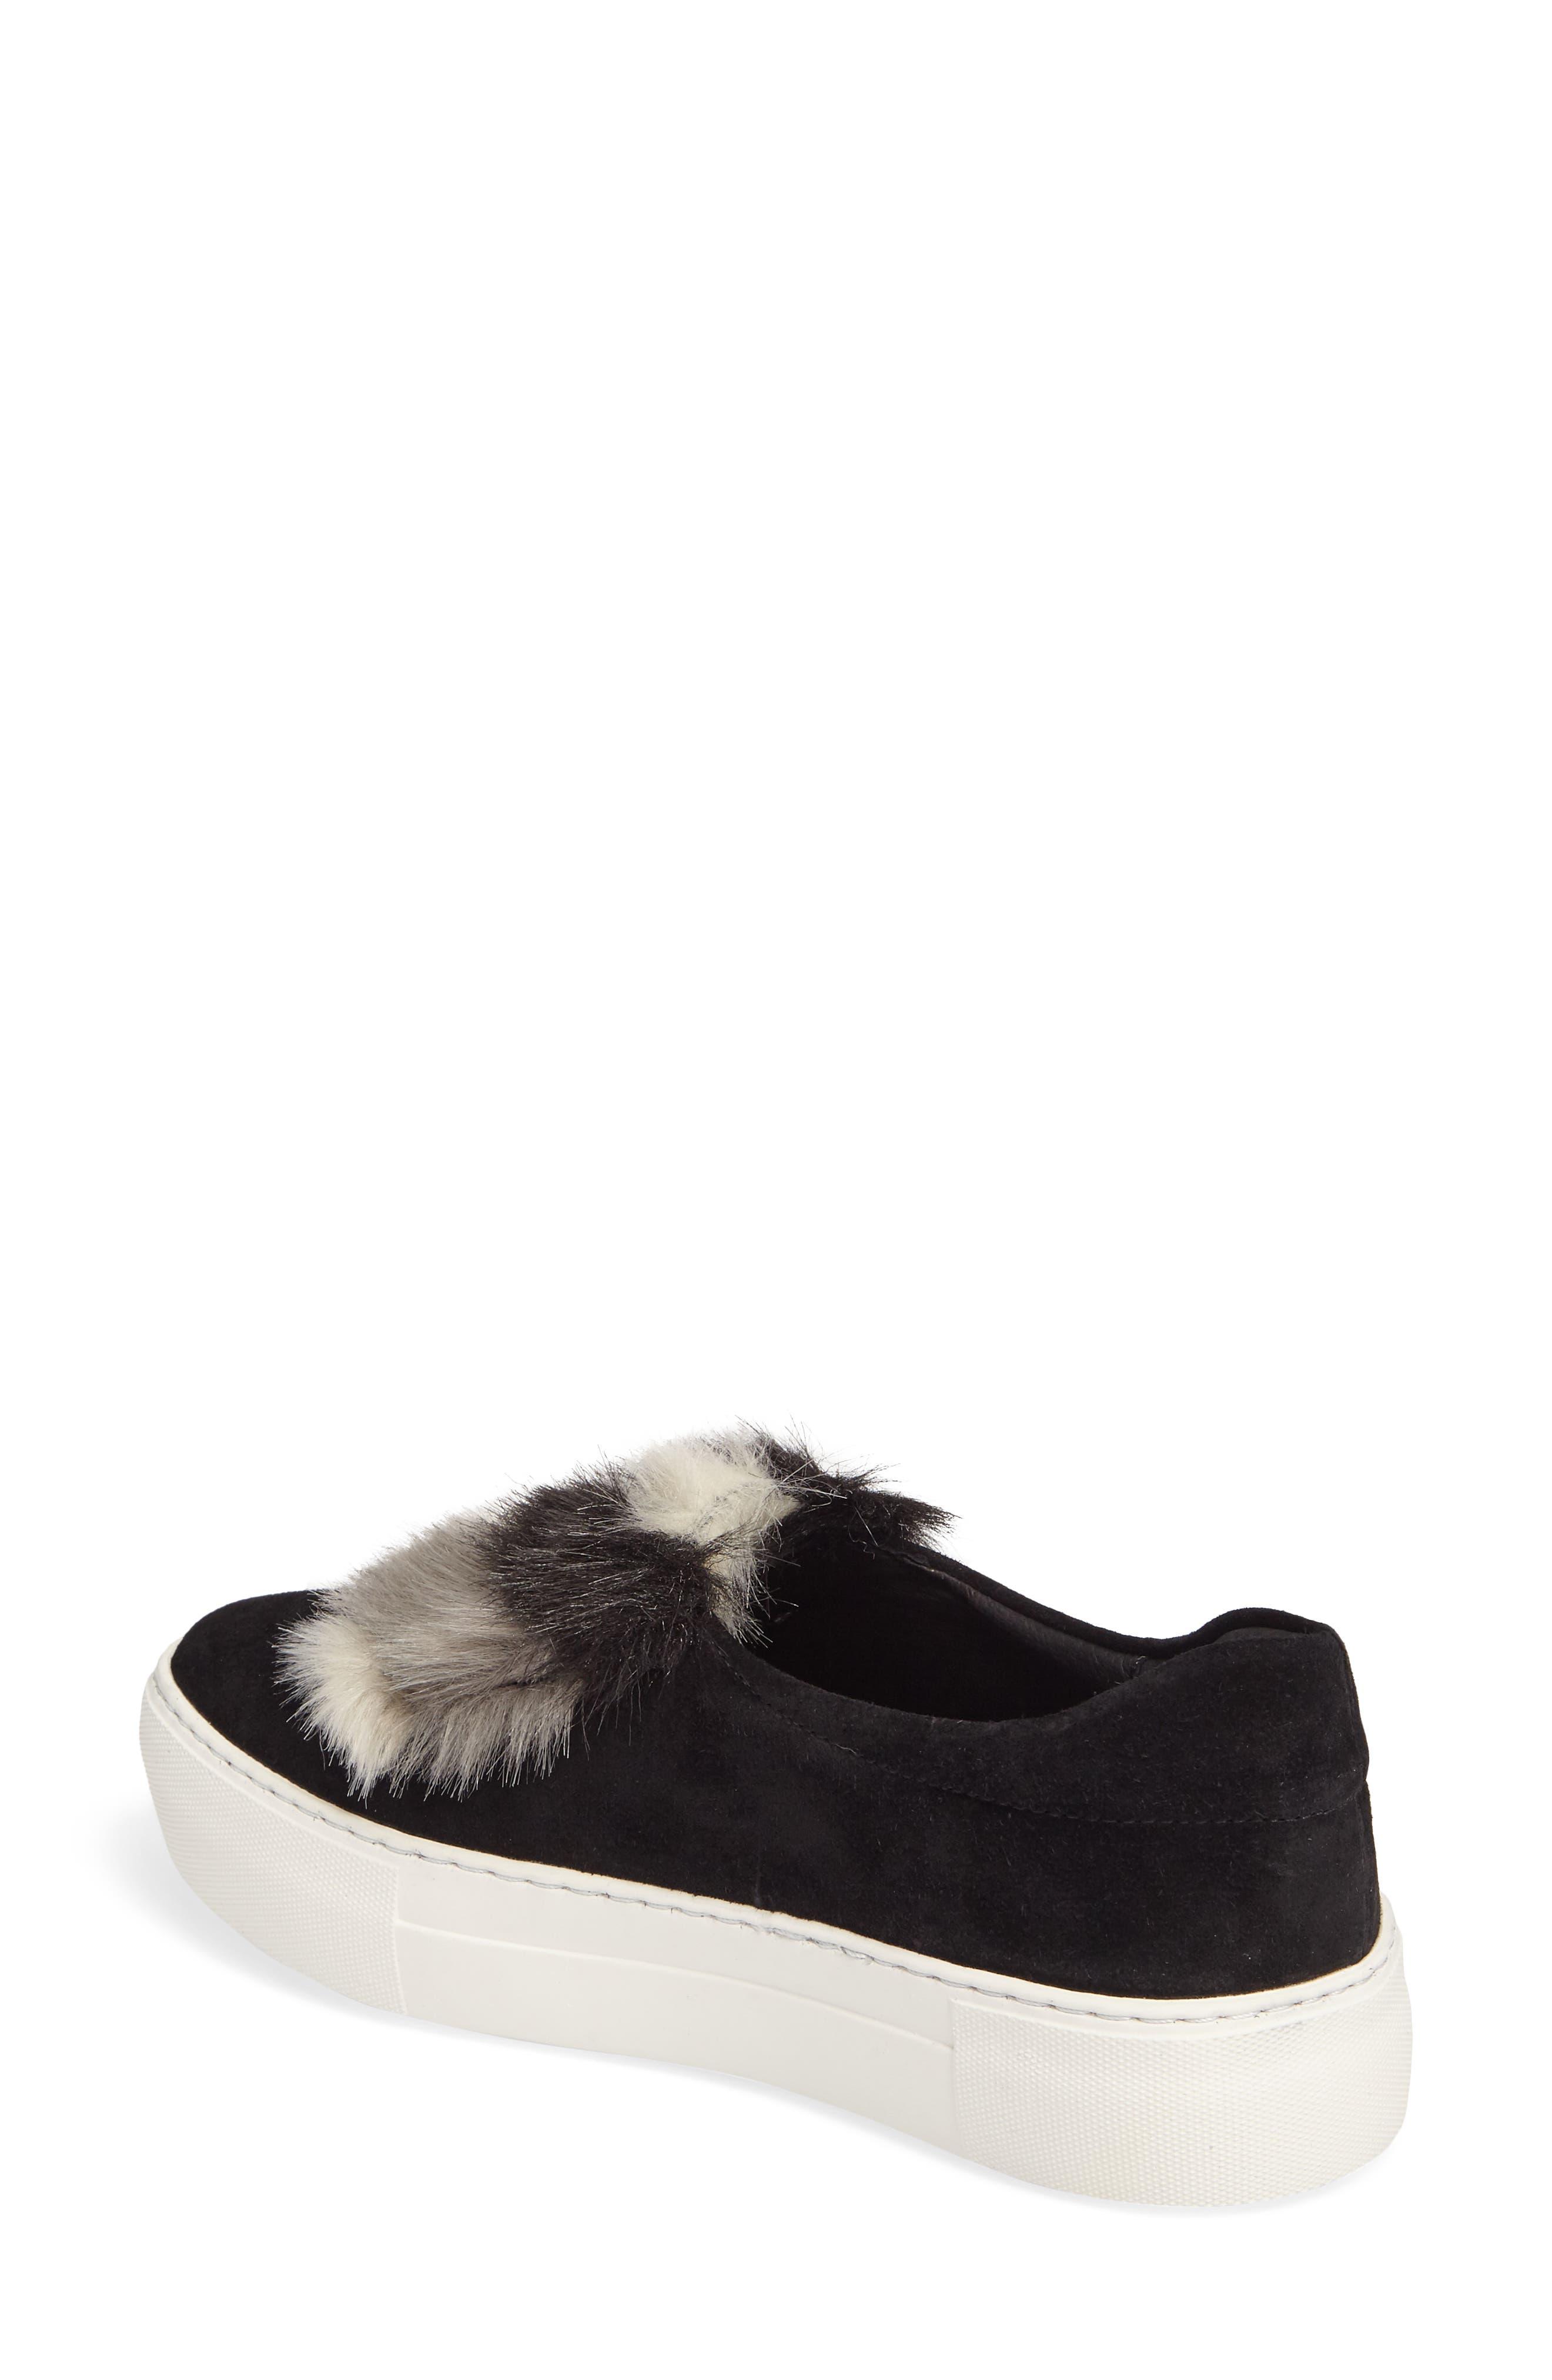 Alexi Faux Fur Slip-On Sneaker,                             Alternate thumbnail 2, color,                             002